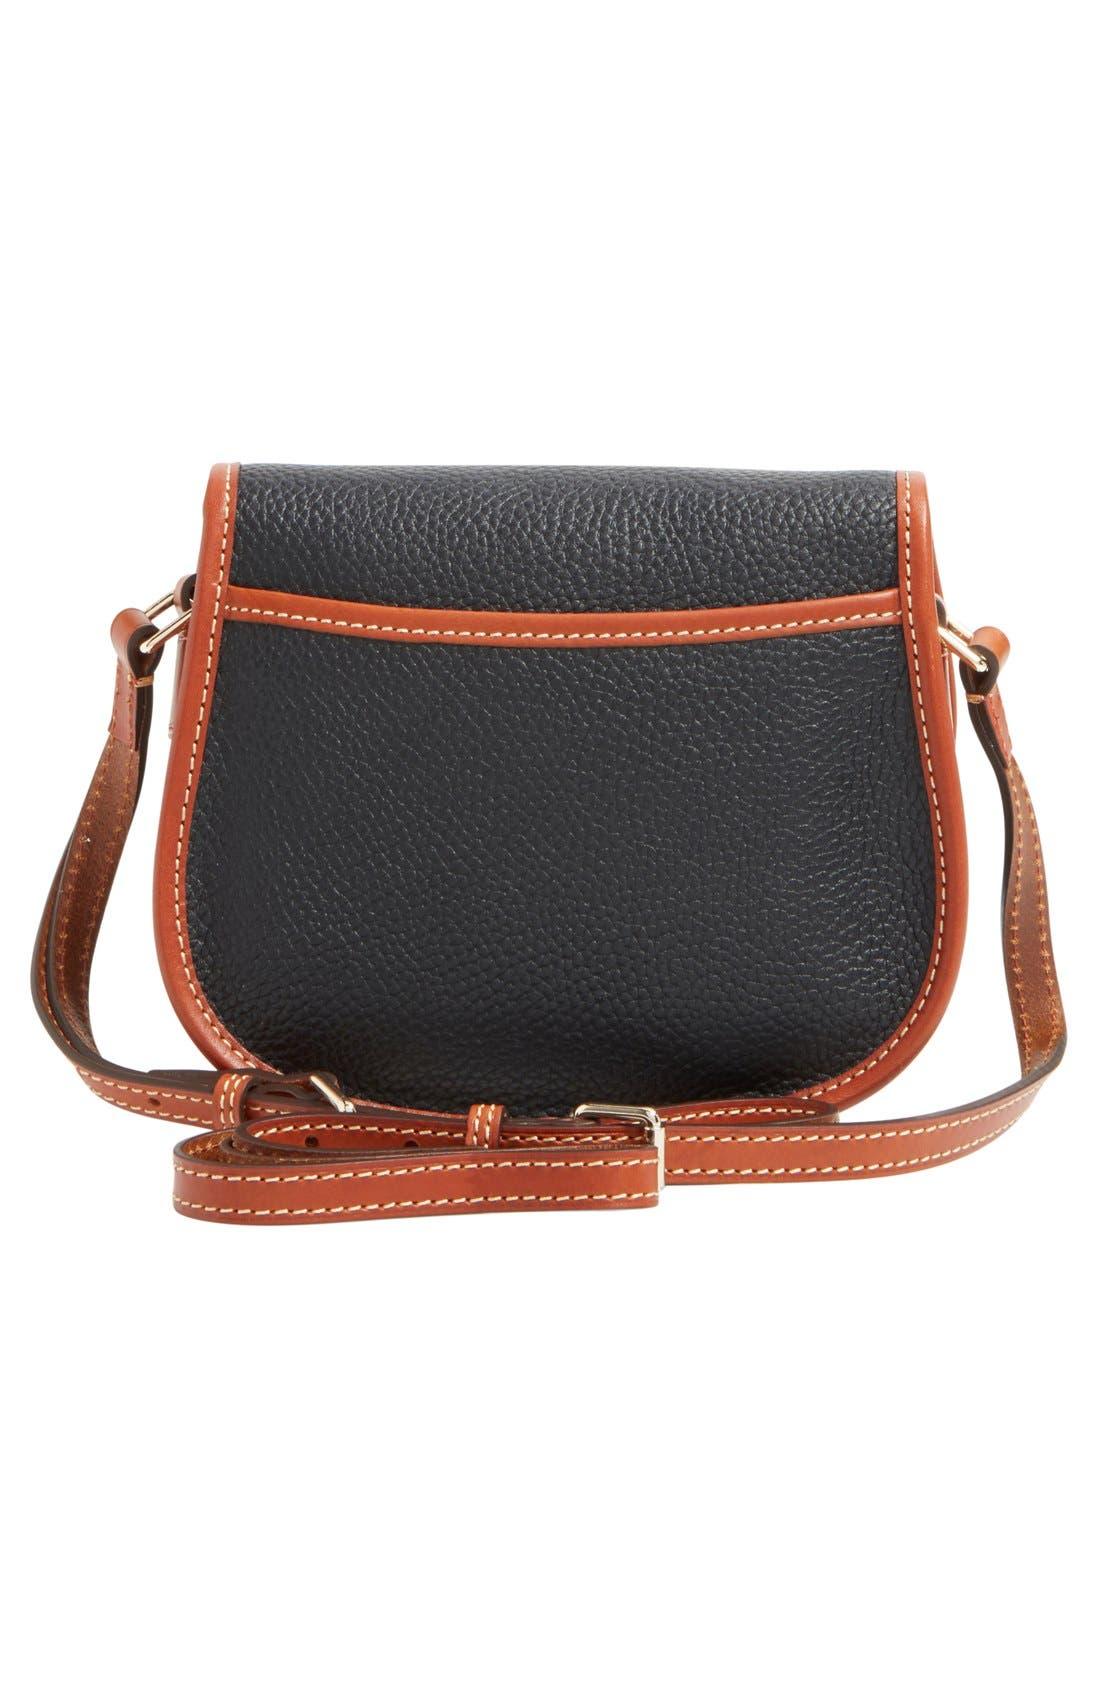 'Hallie' Leather Crossbody Bag,                             Alternate thumbnail 3, color,                             001